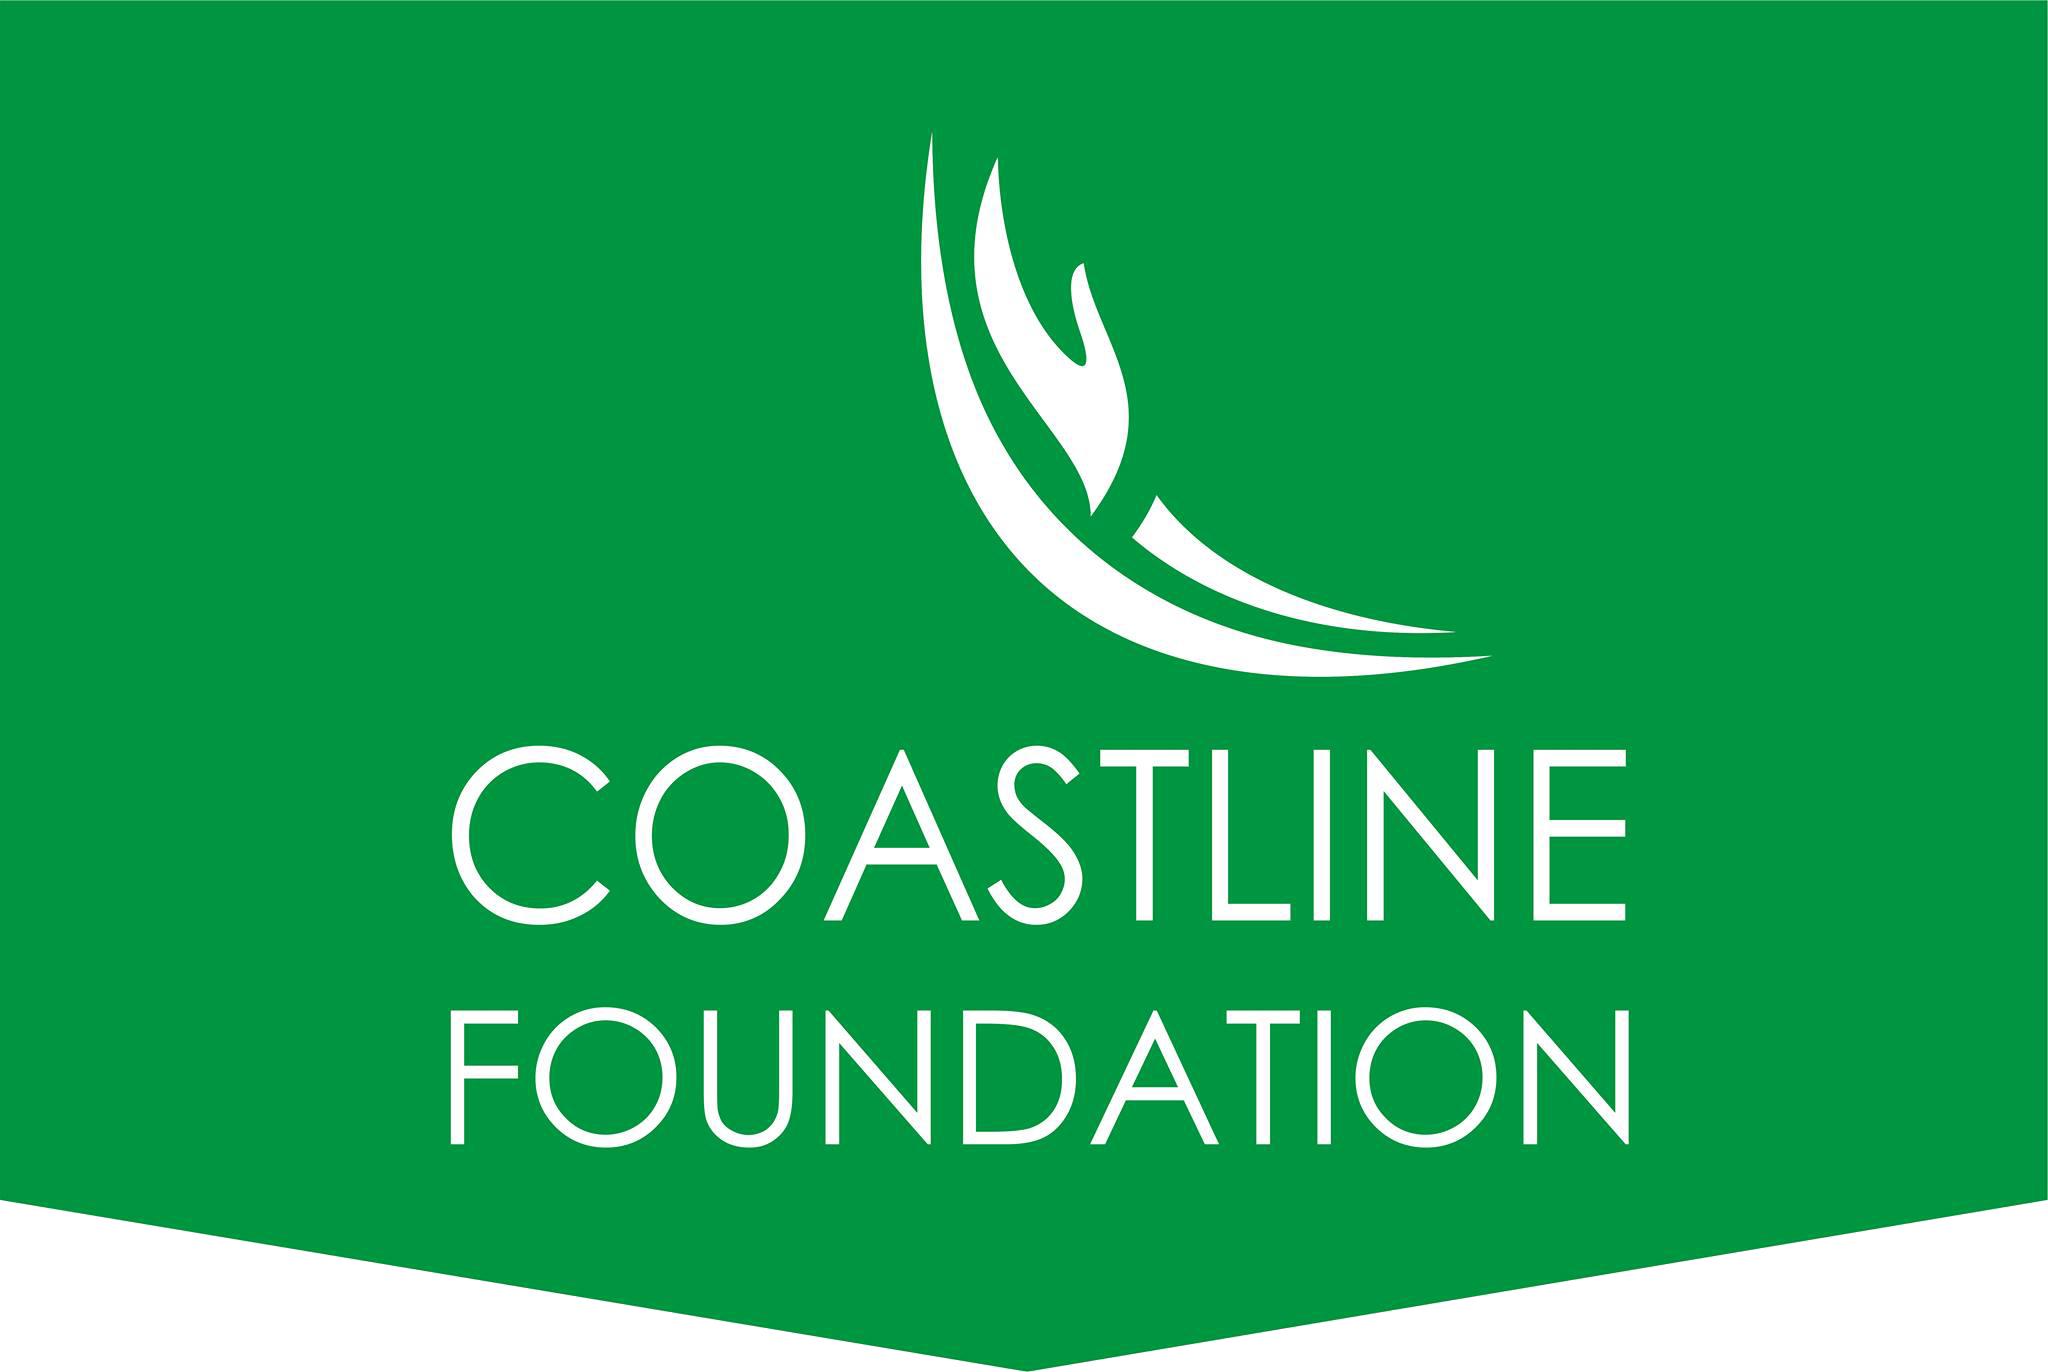 Coastline Foundation